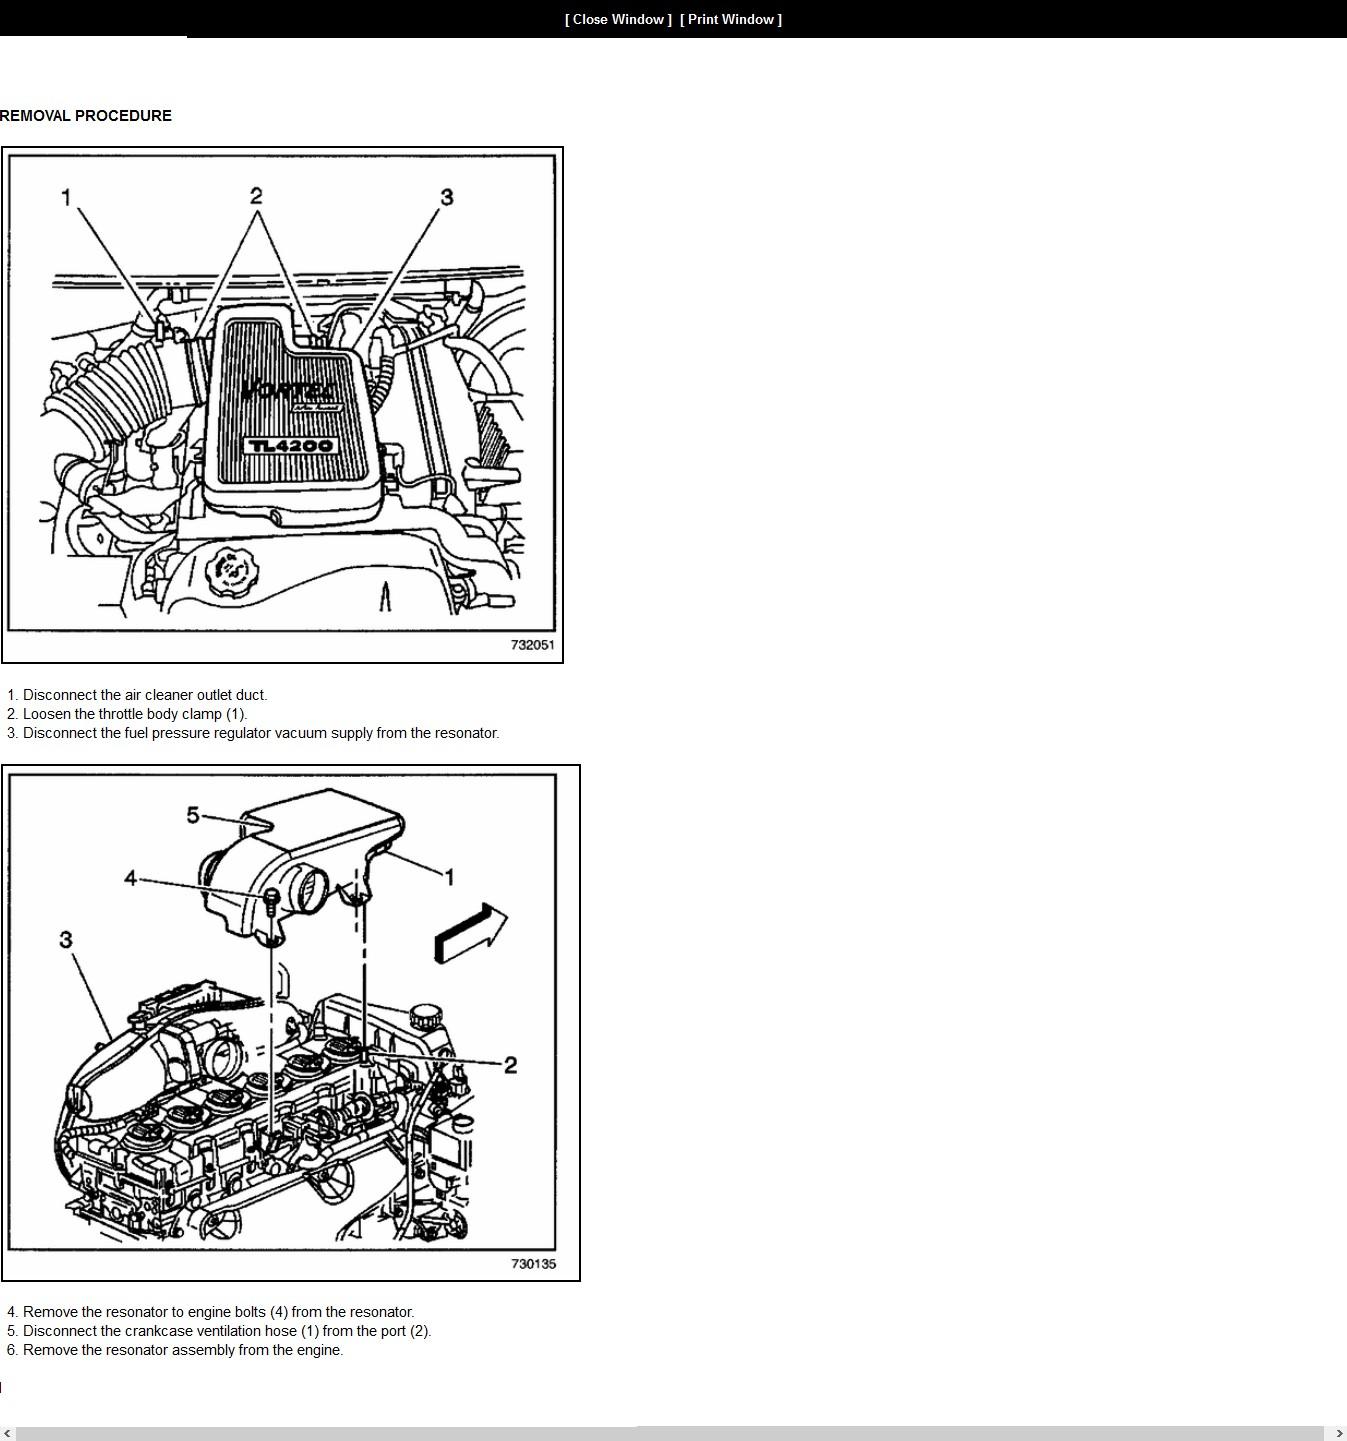 2008 Bmw 328i Engine Parts Diagram Chevy Trailblazer Engine Diagram Wiring Diagrams Post Of 2008 Bmw 328i Engine Parts Diagram